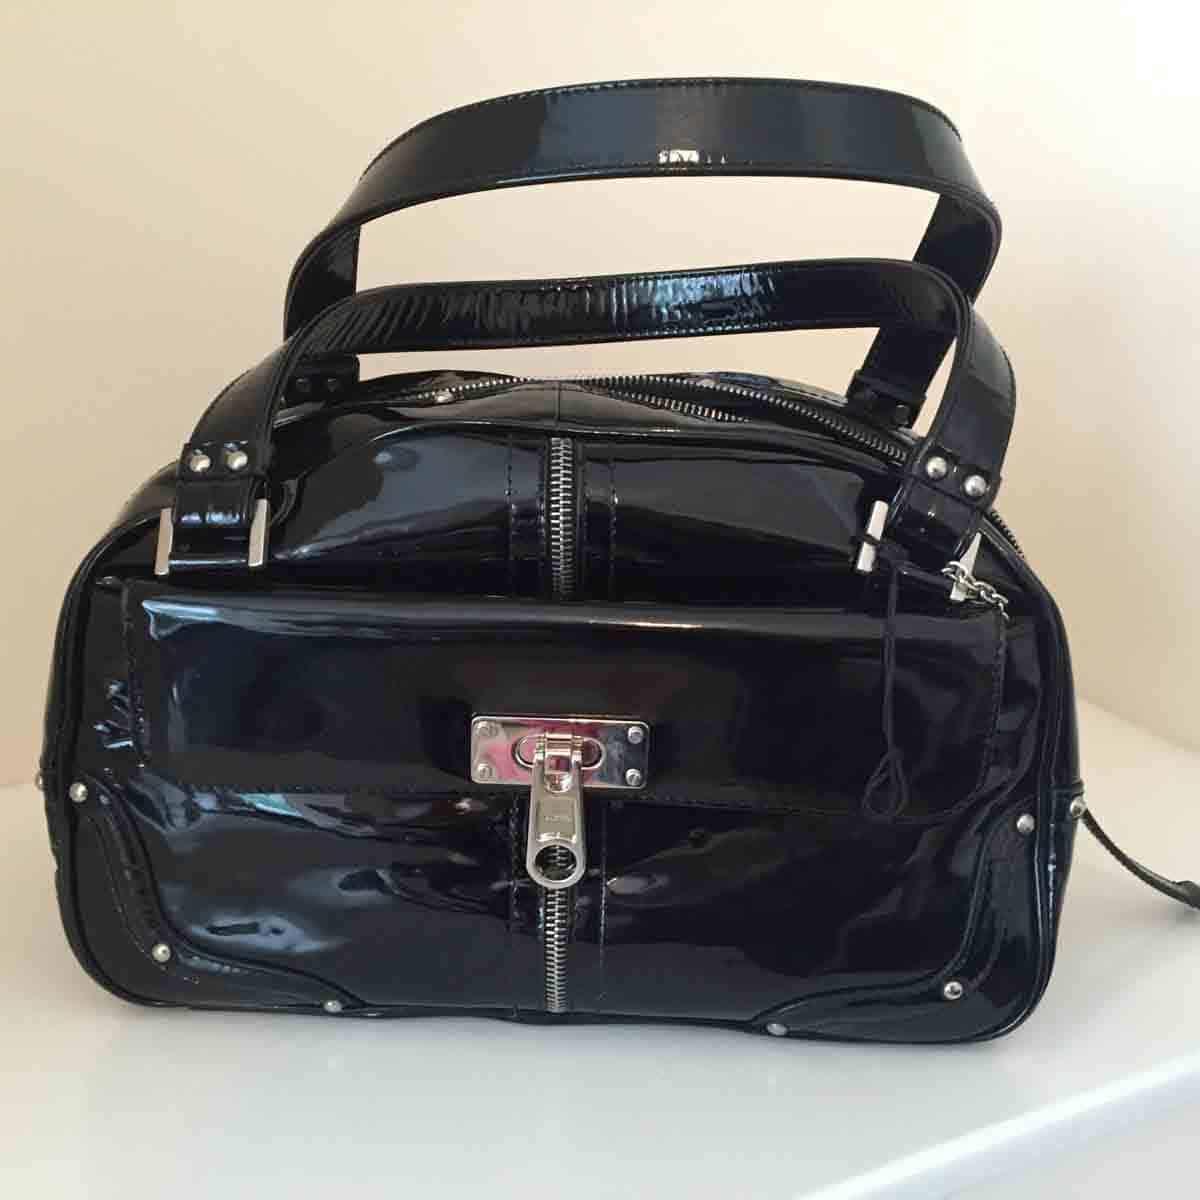 00568edf7 New and Very Rare Luella handbag - Seeking Perfect Purchase